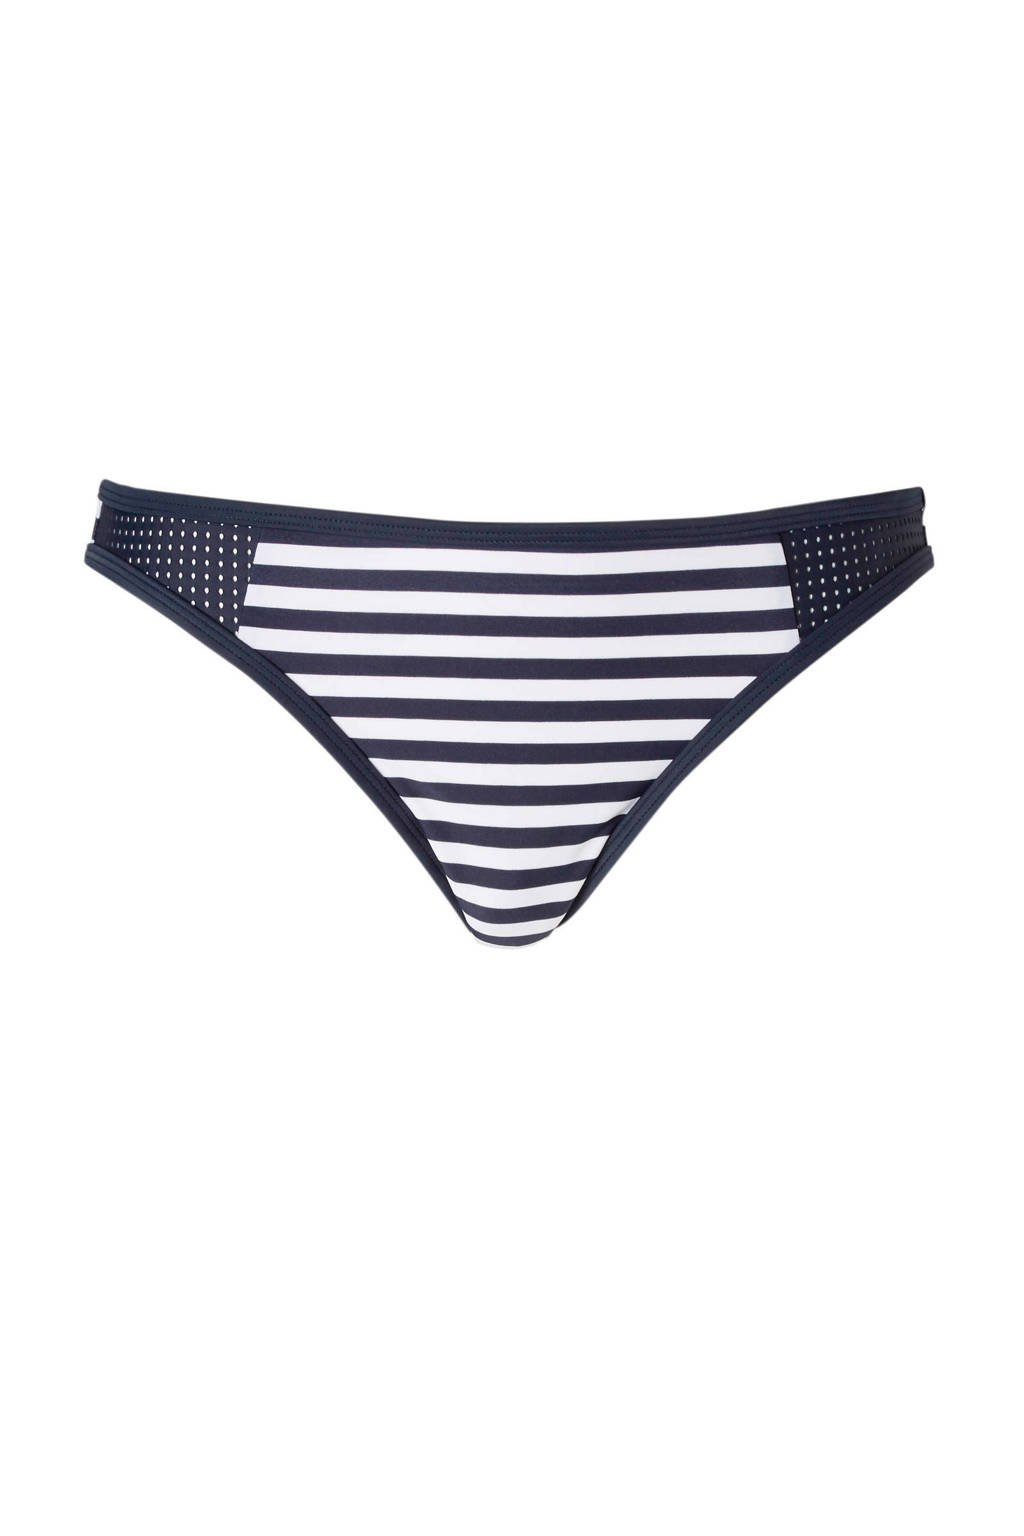 Broekje Beach Beach Gestreept Espritwomen Broekje Espritwomen Bikini Espritwomen Broekje Bikini Espritwomen Bikini Gestreept Gestreept Beach YtTTfR